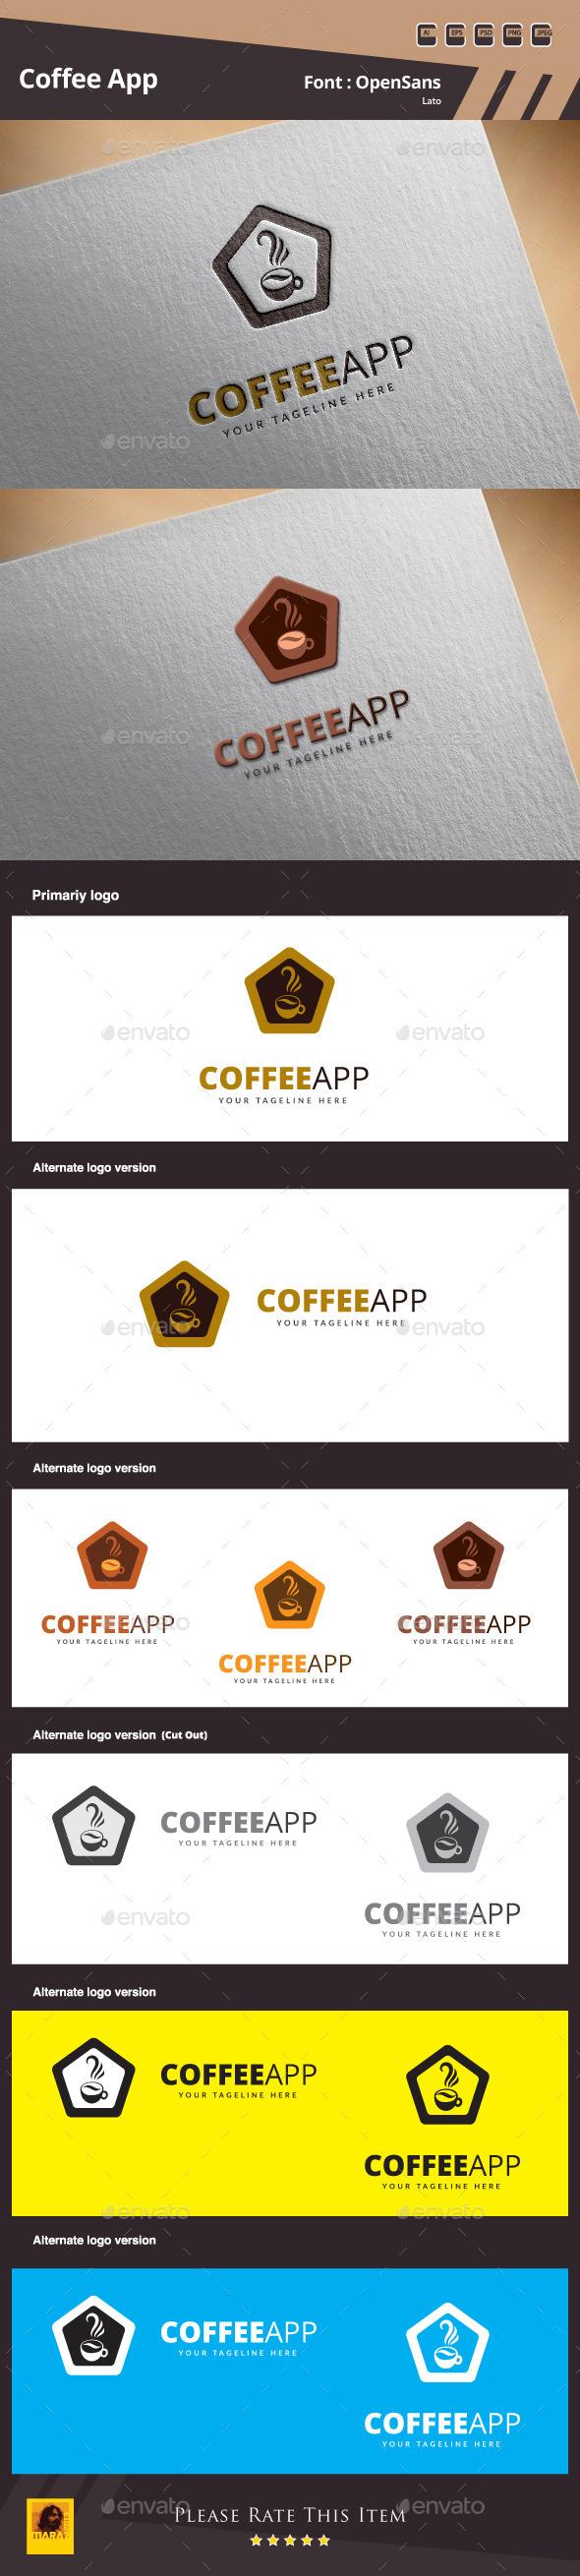 GraphicRiver Coffee App Logo Template 10124769